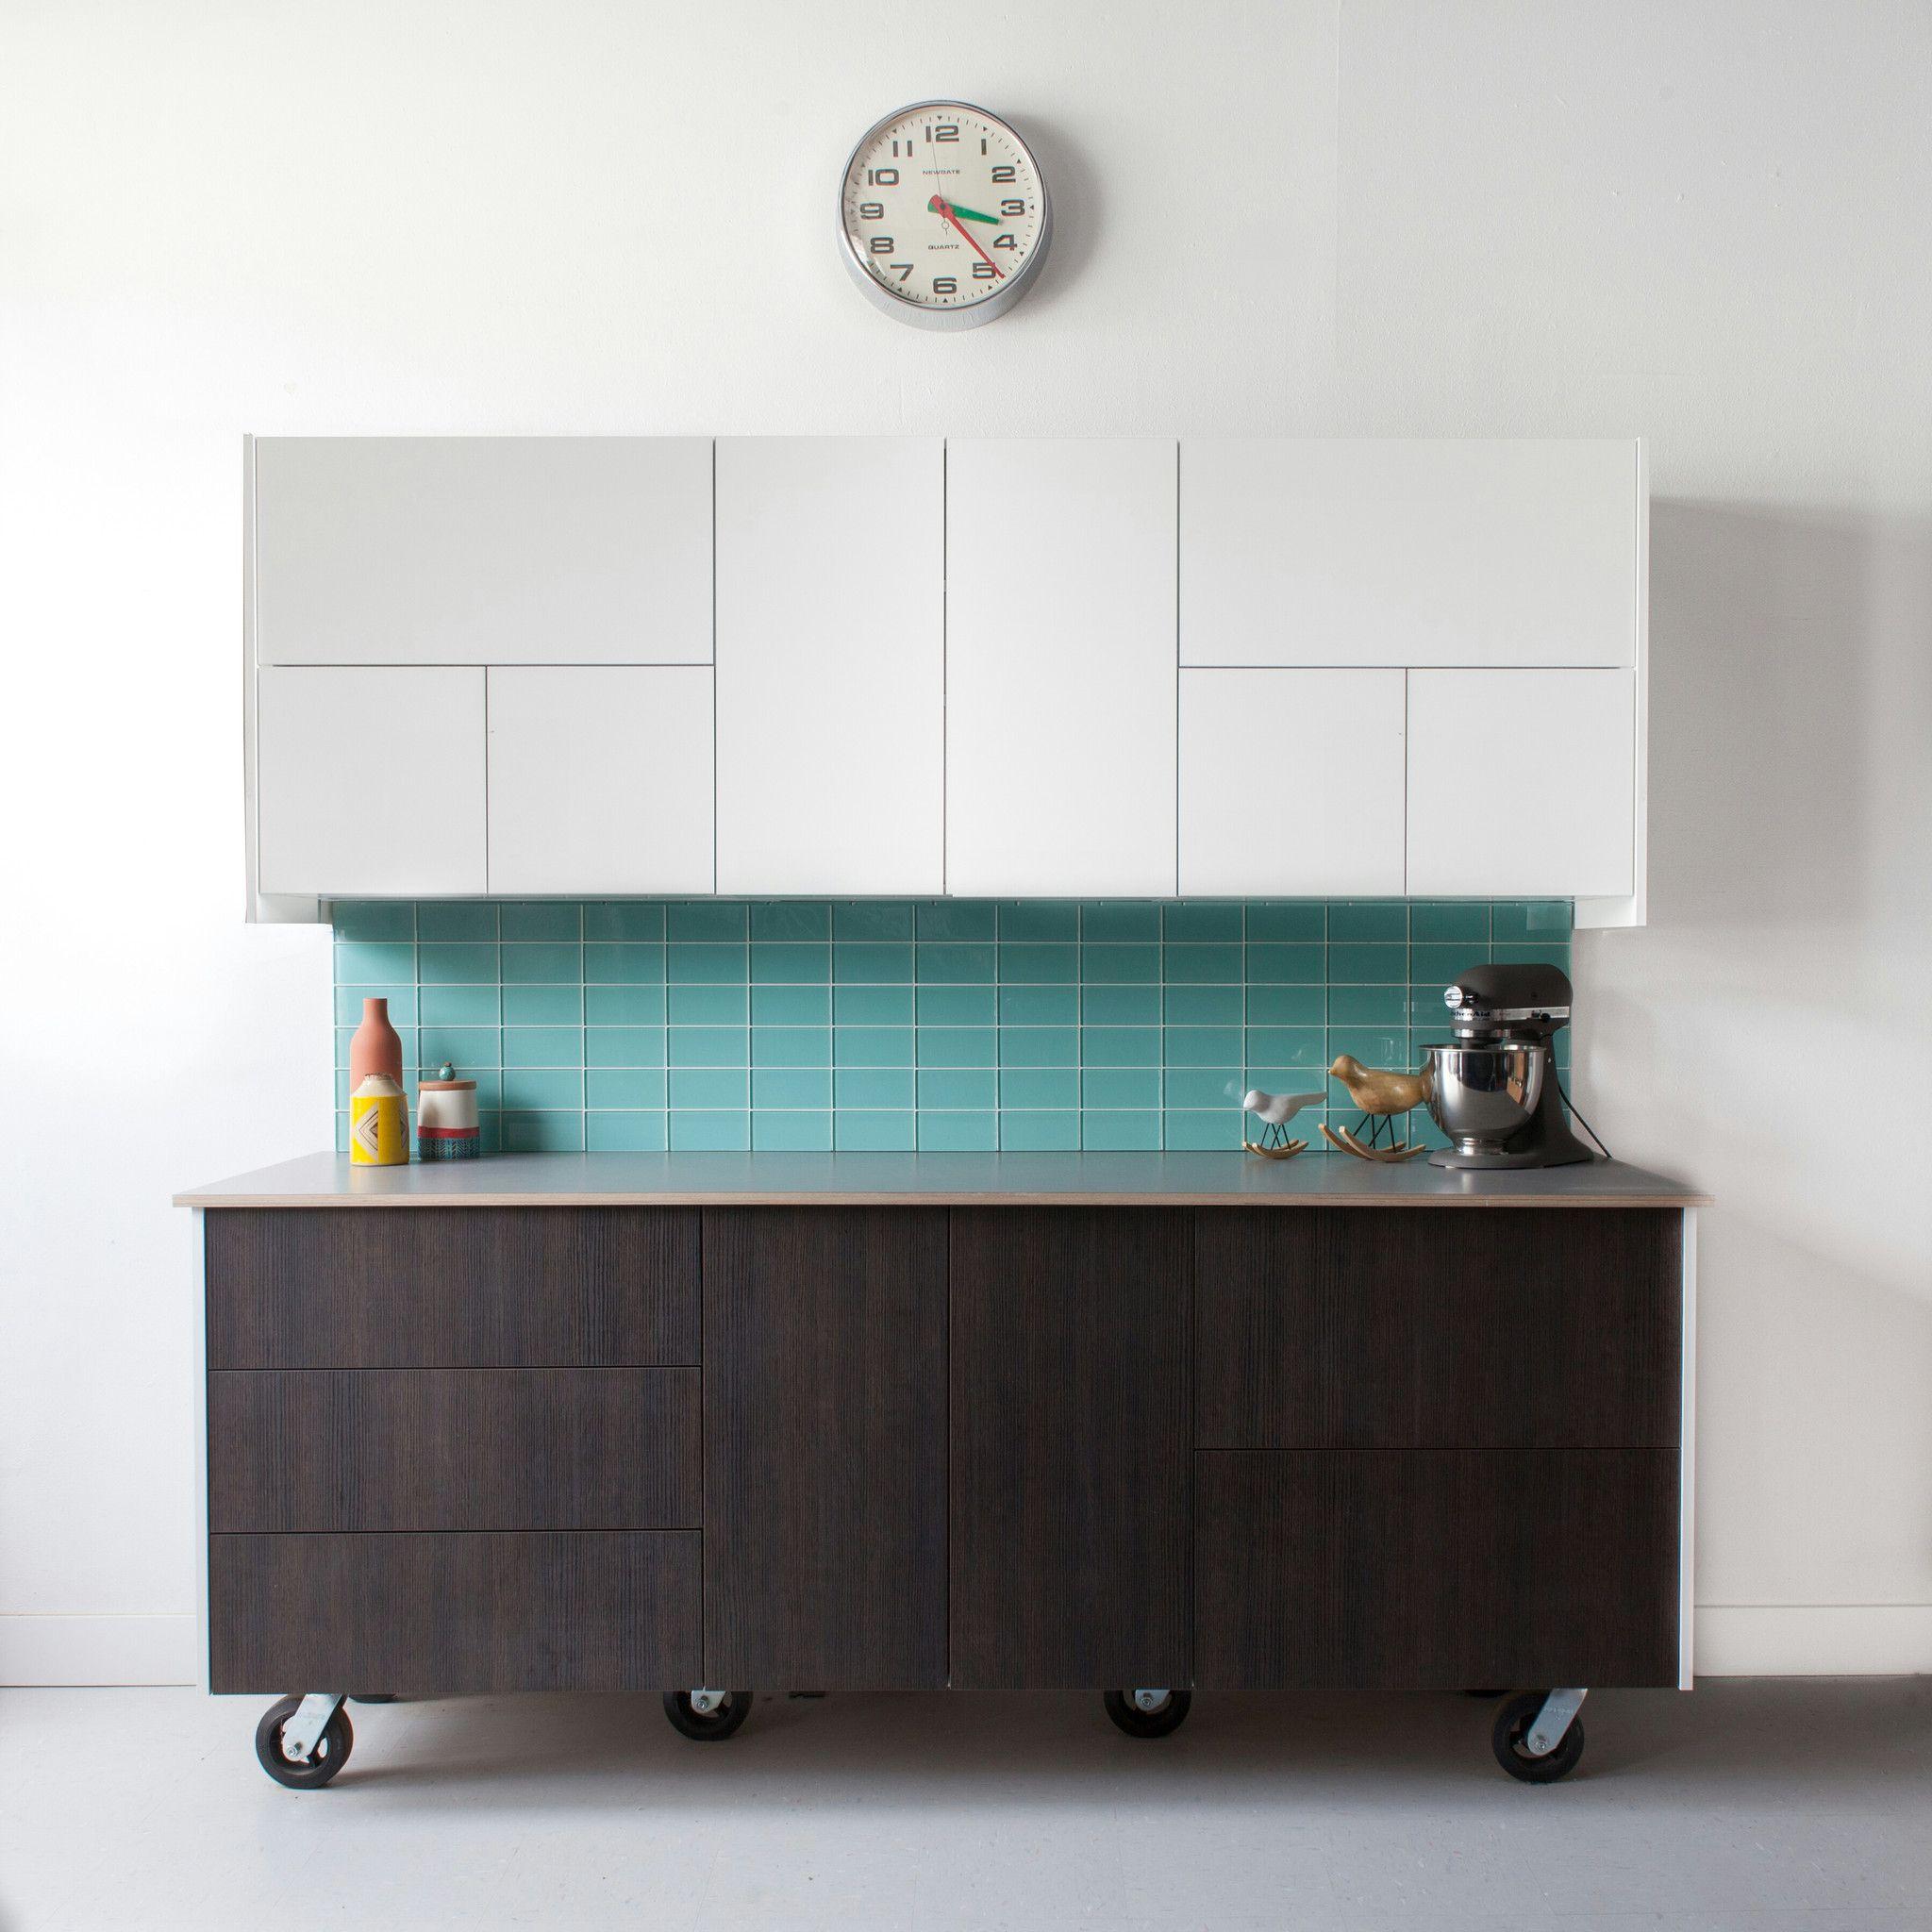 Semihandmade CHARCOAL Impression Door   Ikea Kitchens   Pinterest ...